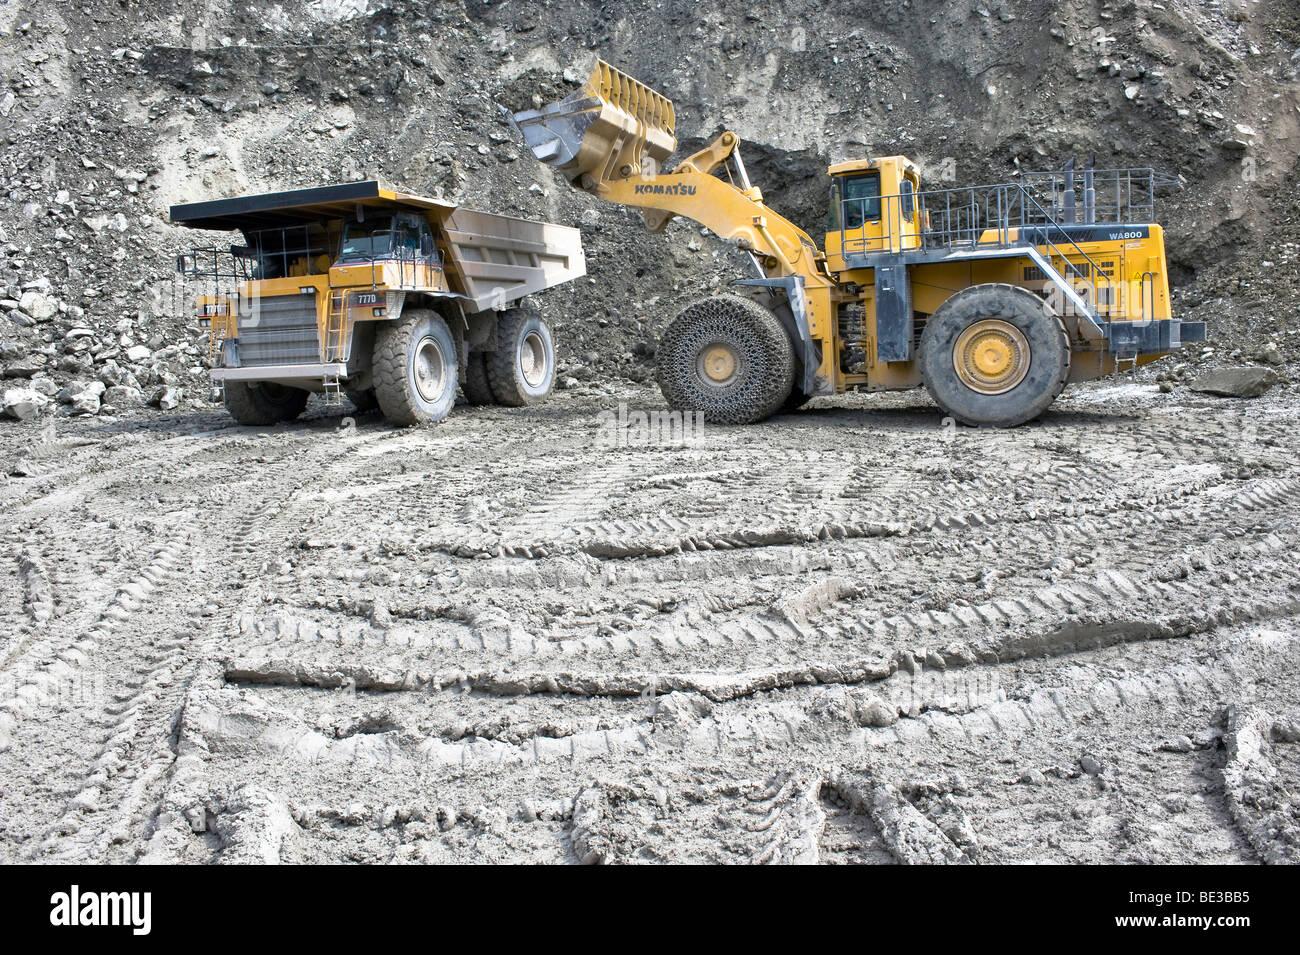 Concrete Plant Loader : Komatsu truck stock photos images